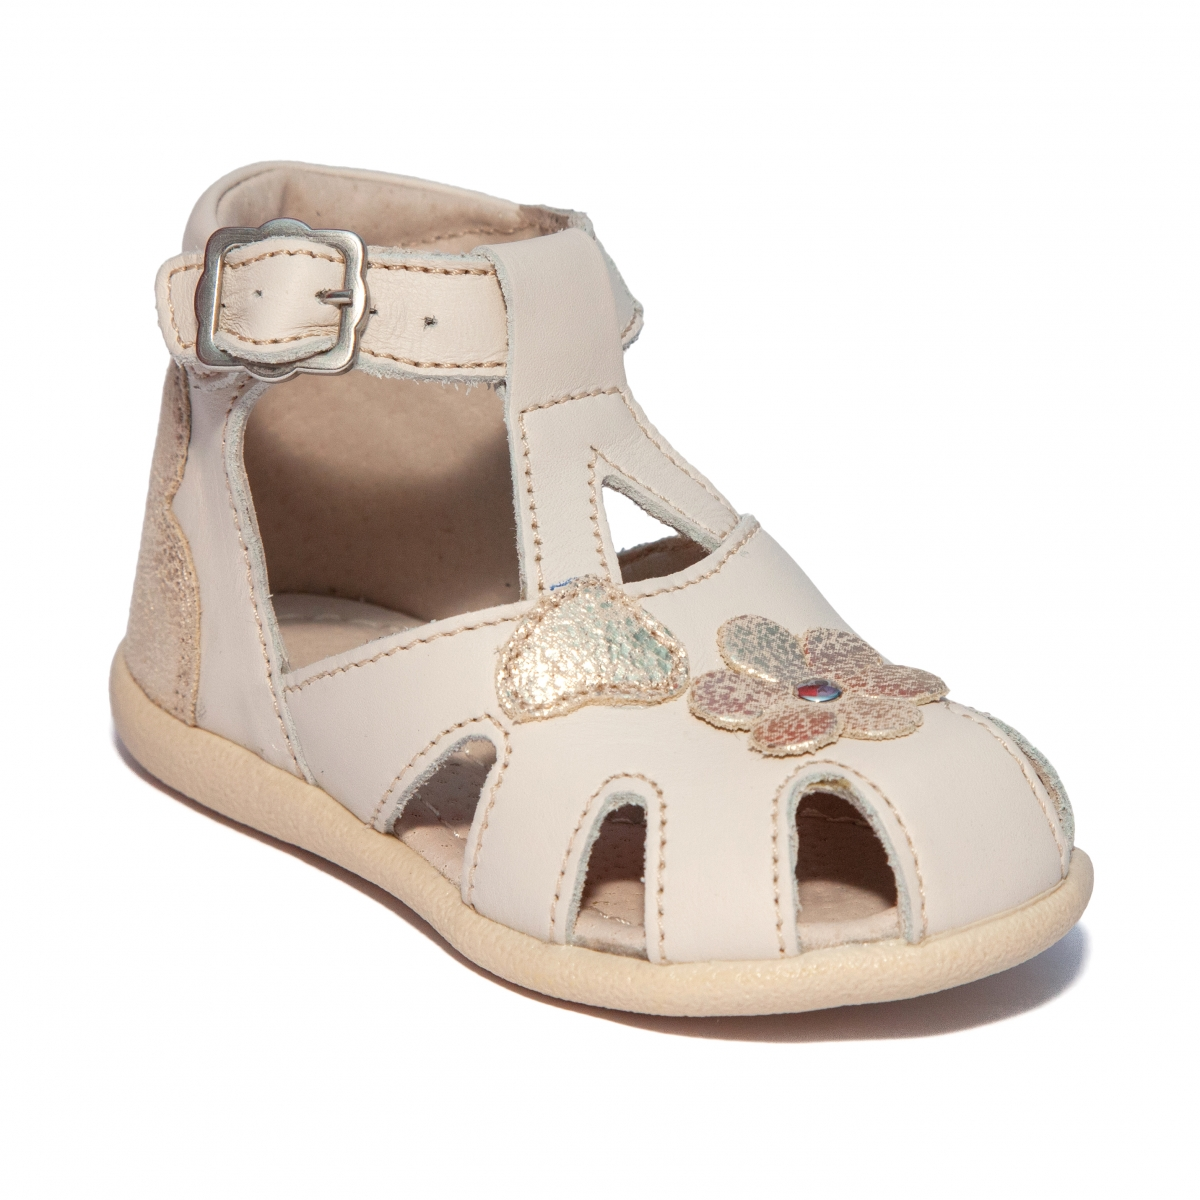 Sandalute fete inalte pe glezna hokide 77 crem 18-24